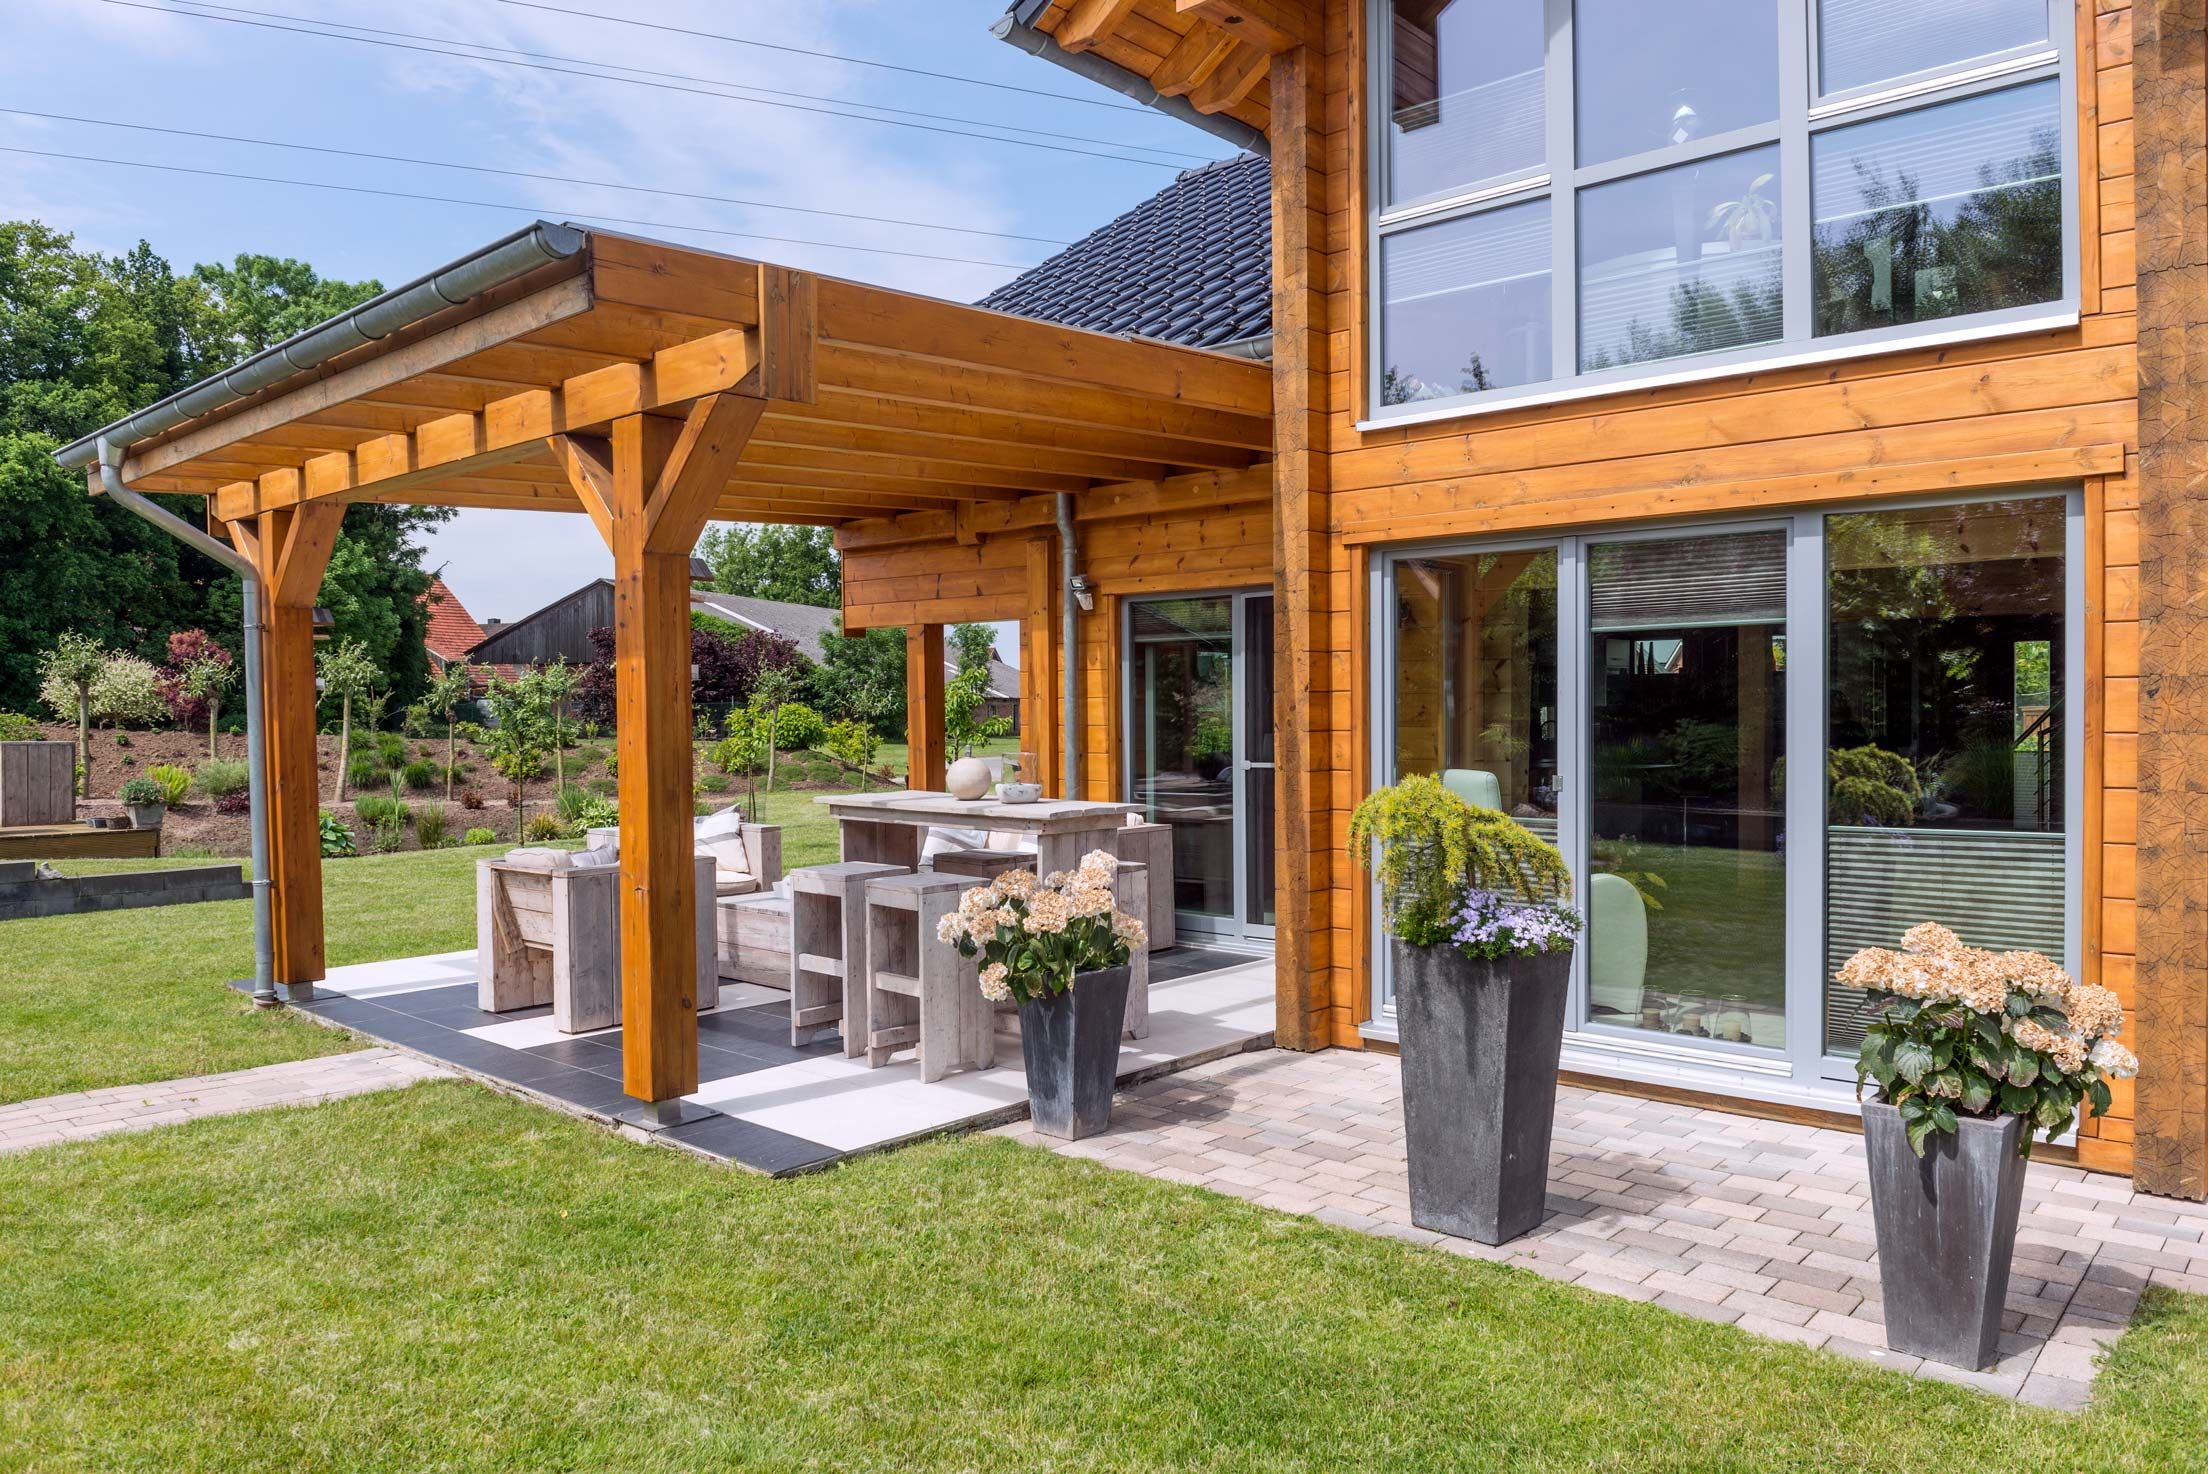 ^ 1000+ ideas about Massivholzhaus on Pinterest Lichthaus, Küche ...